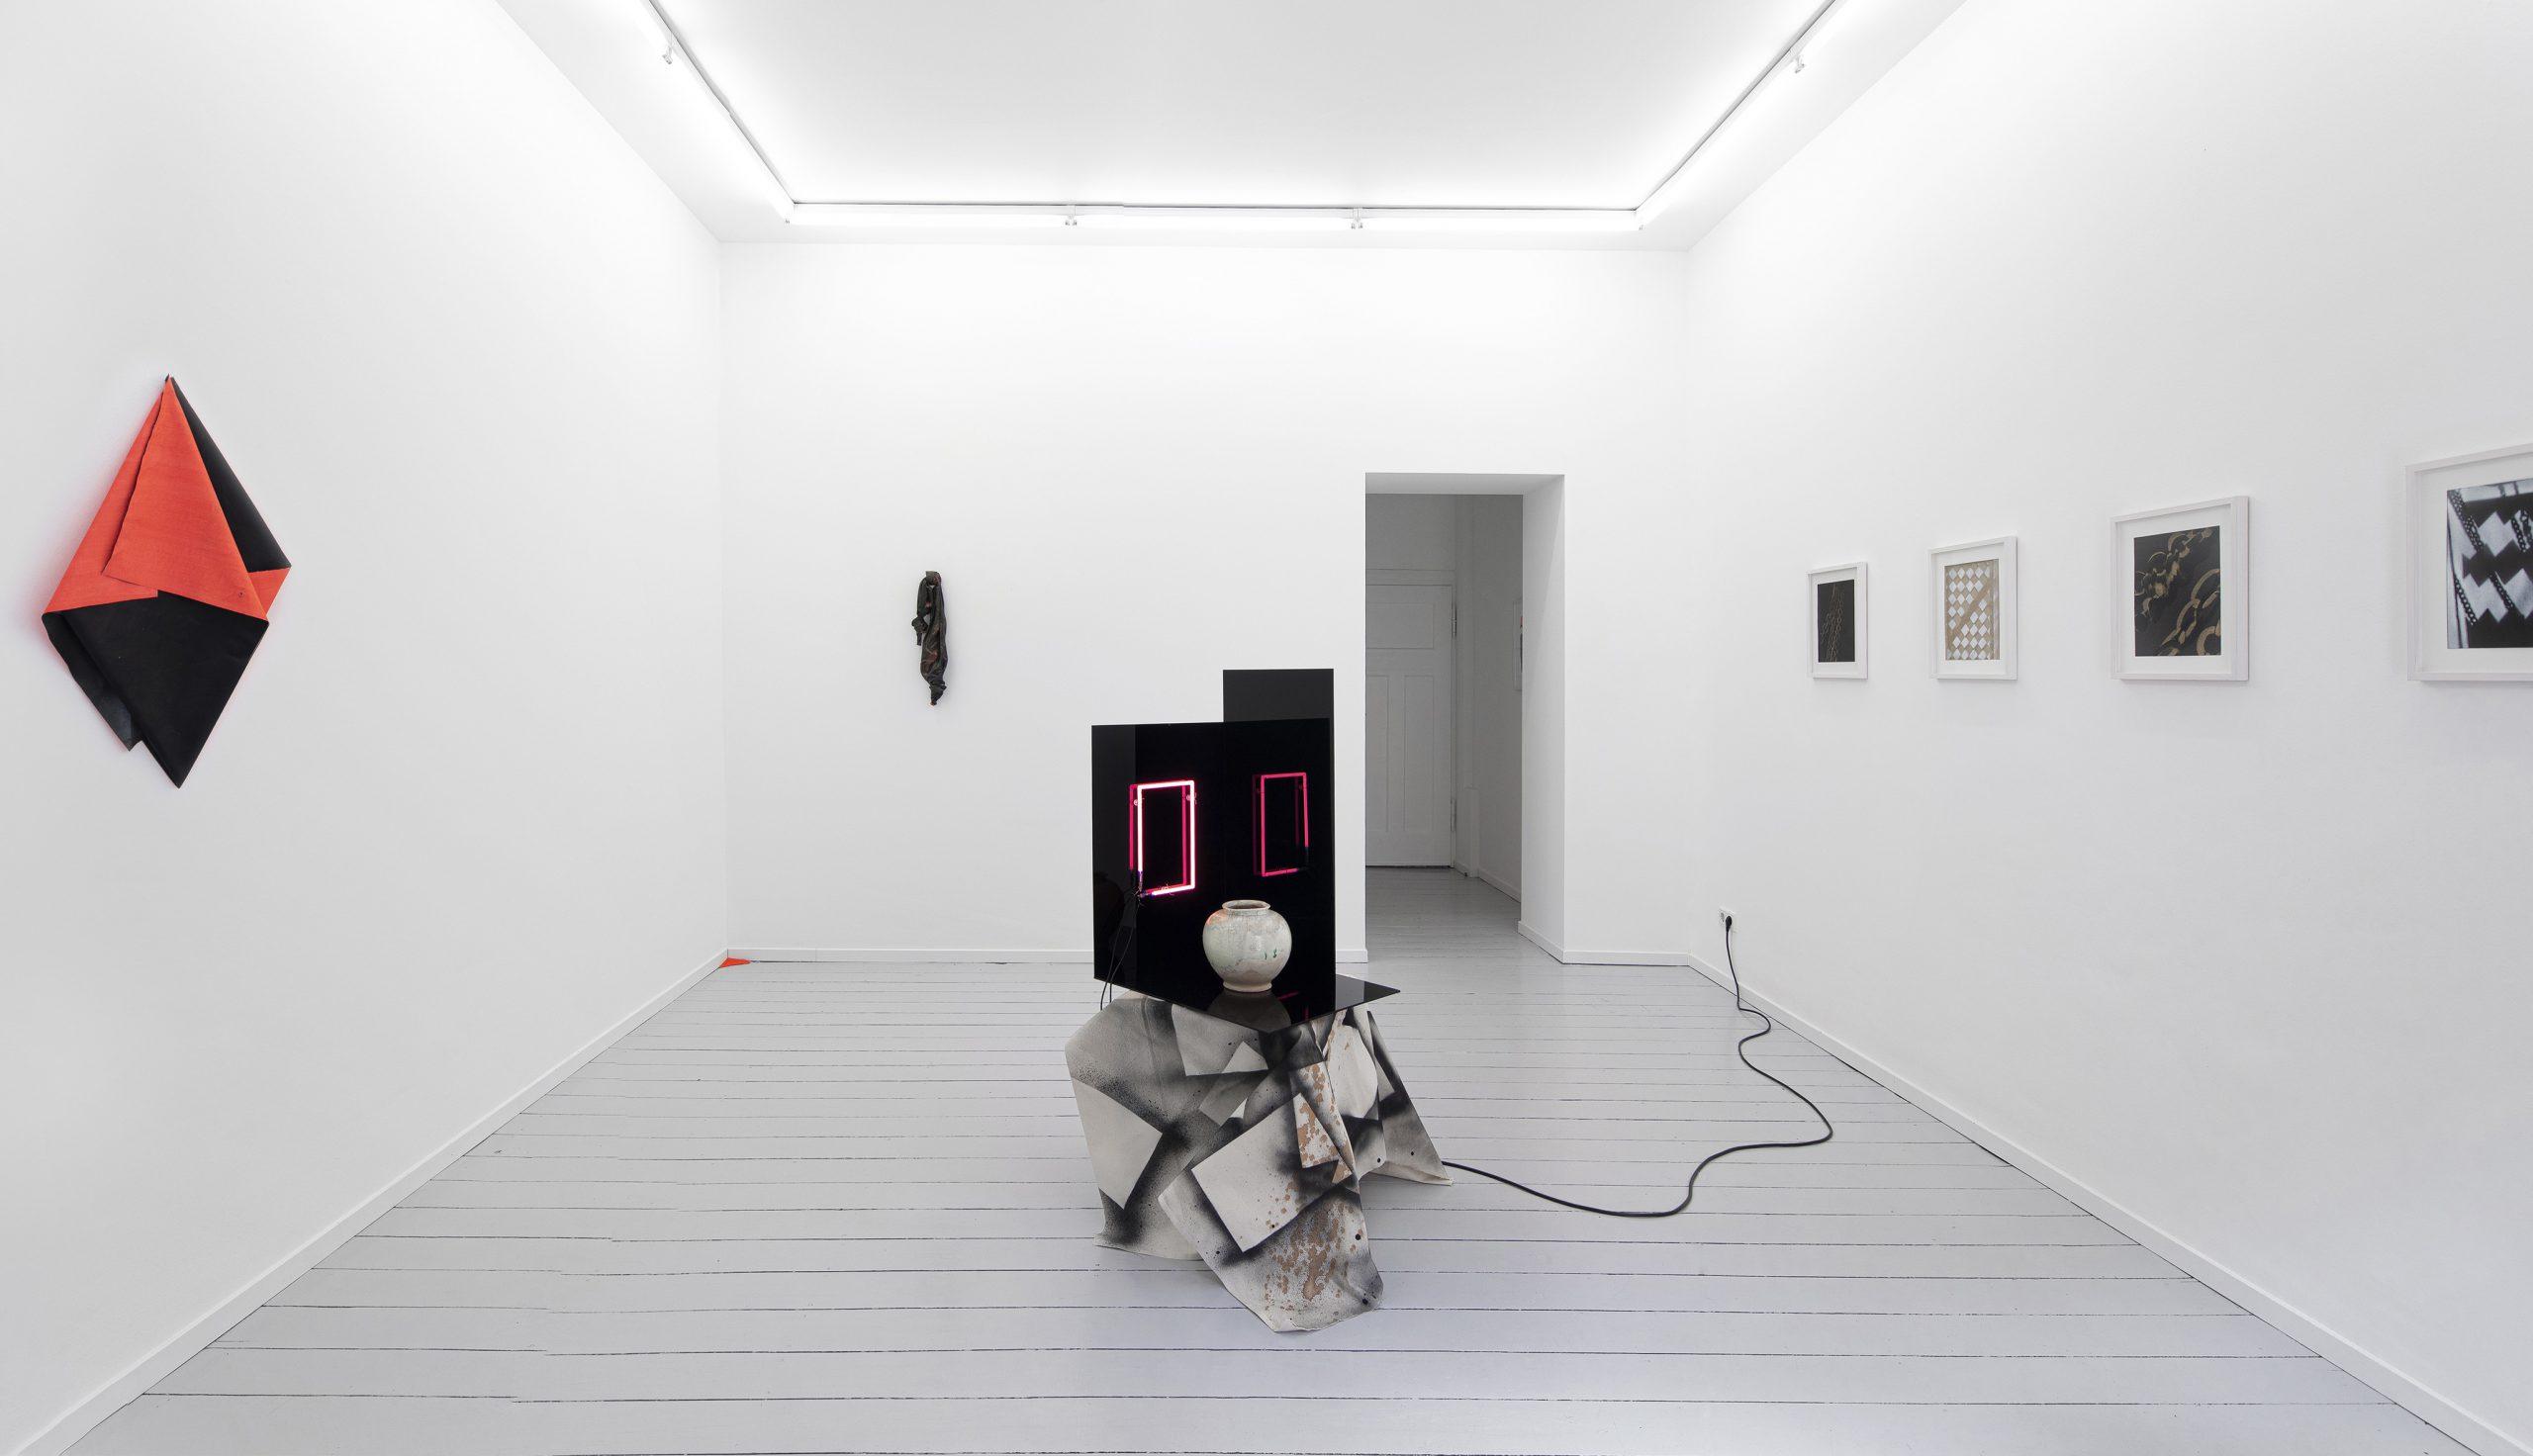 Anna Friedel | Studio Crate Digging | basedonart gallery | Düsseldorf | 2019 | Photo: Johannes Pöttgens